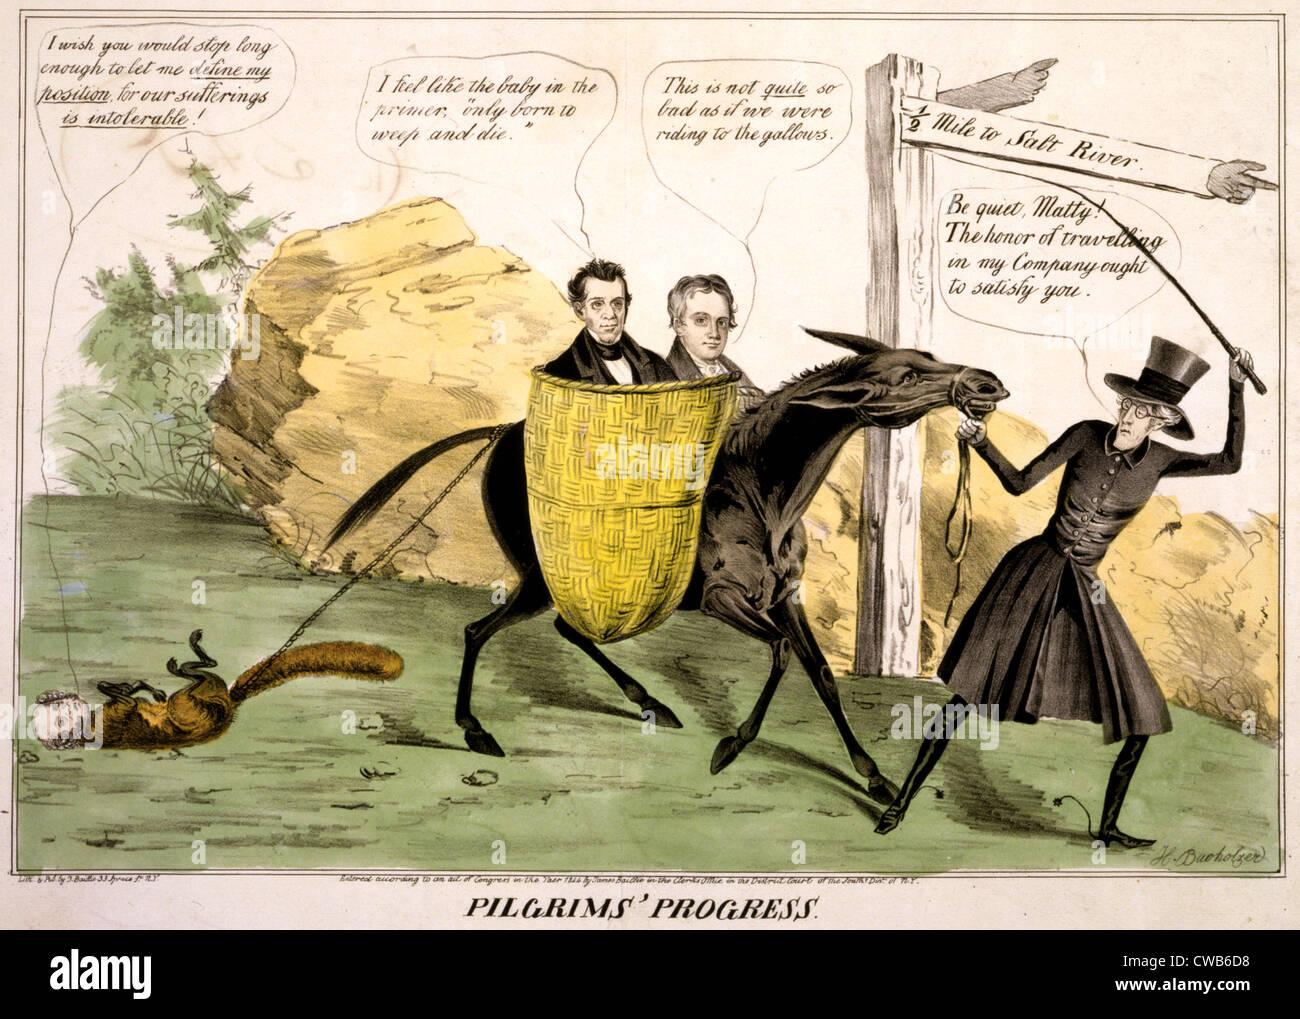 'Pilgrims' progress', showing ex-President Andrew Jackson leading the Democratic Party Donkey which - Stock Image